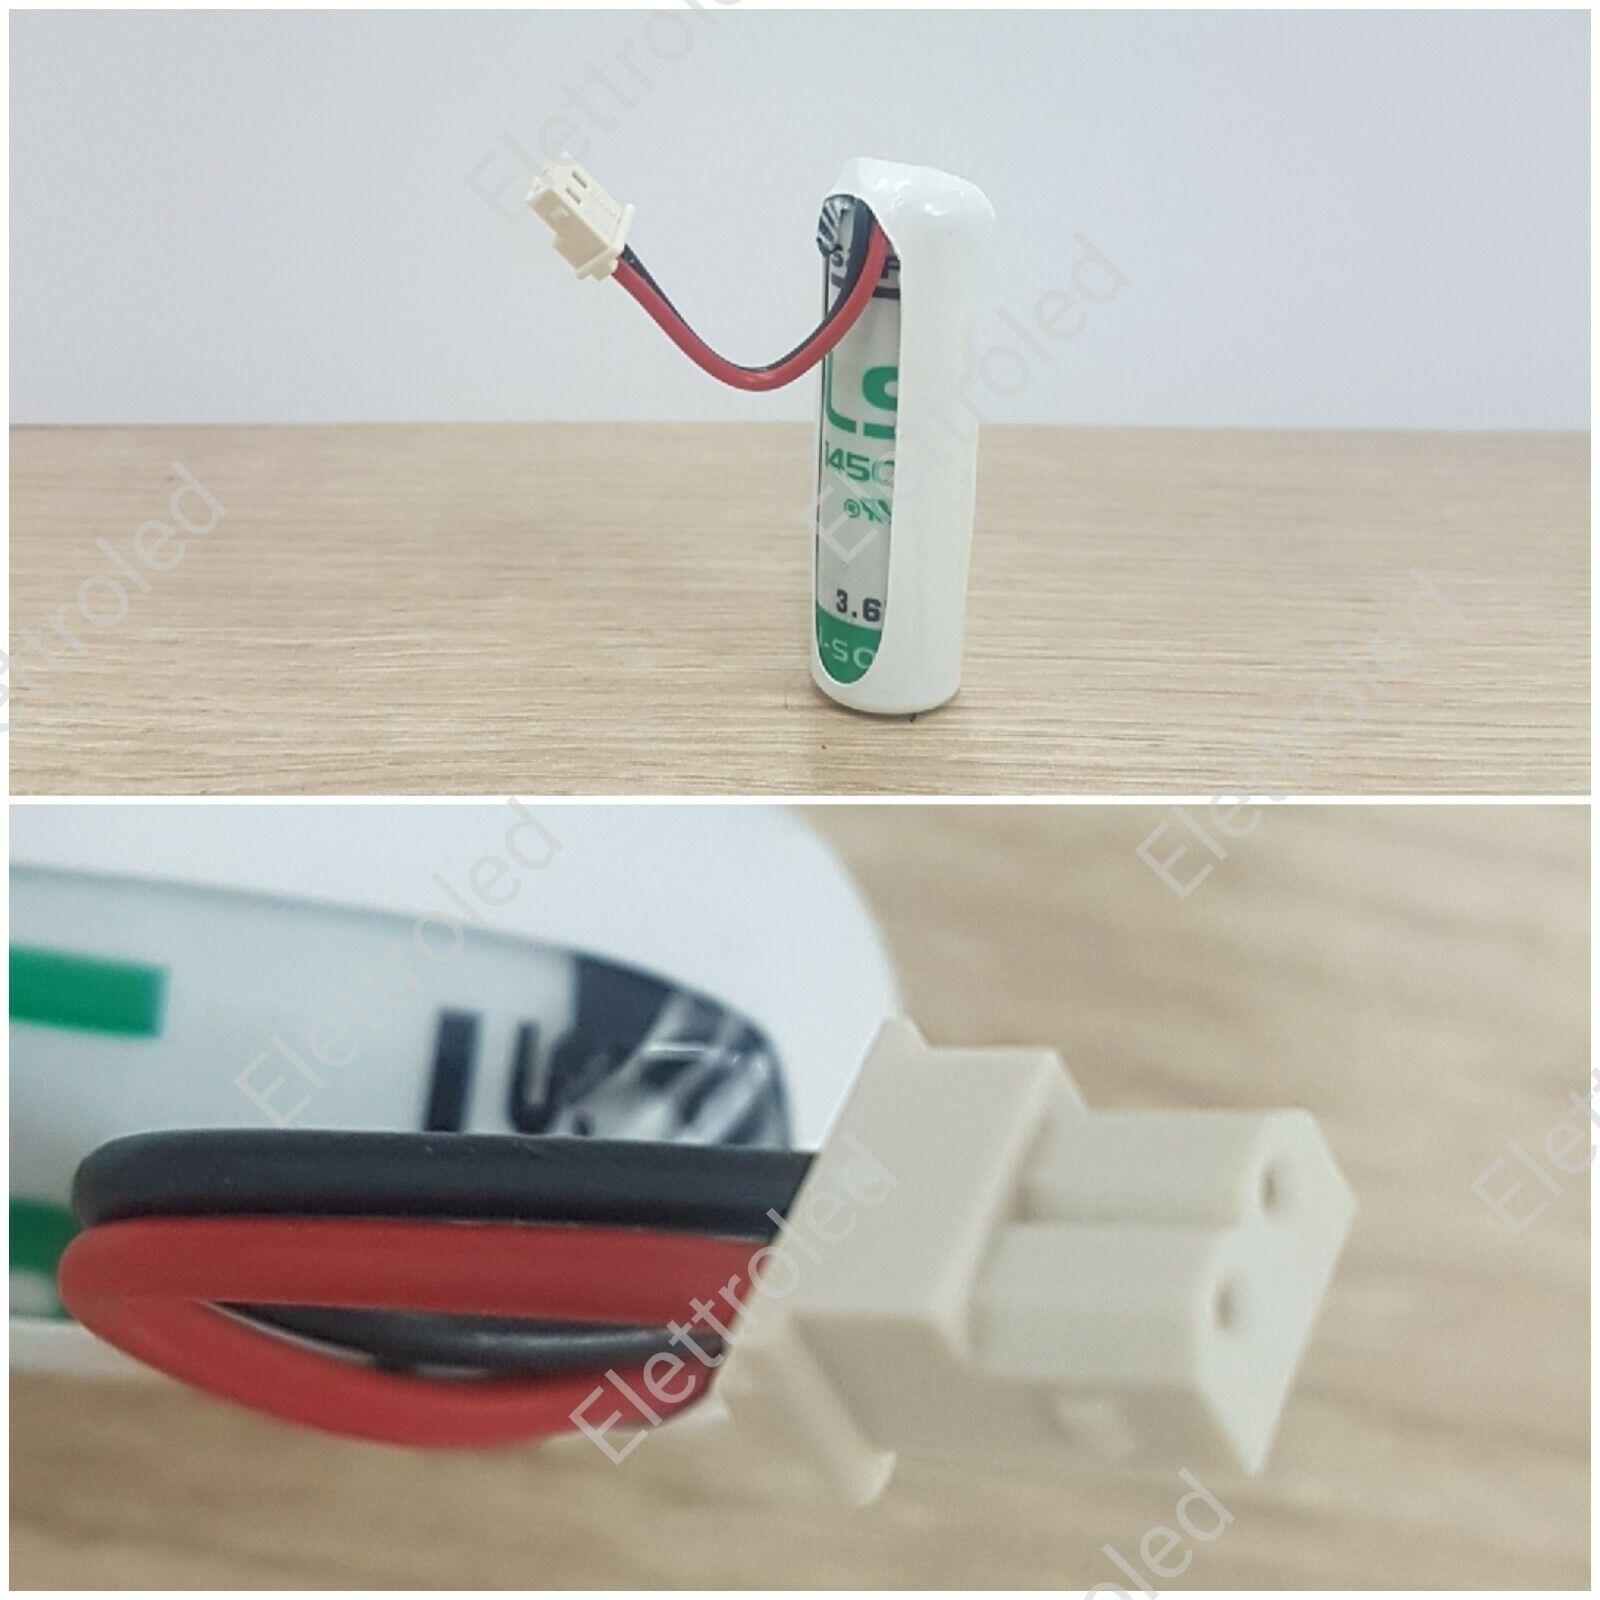 Lithium AA Battery Stylus 3.6v Compatible Security Alarm gt alarm 3,6v saft